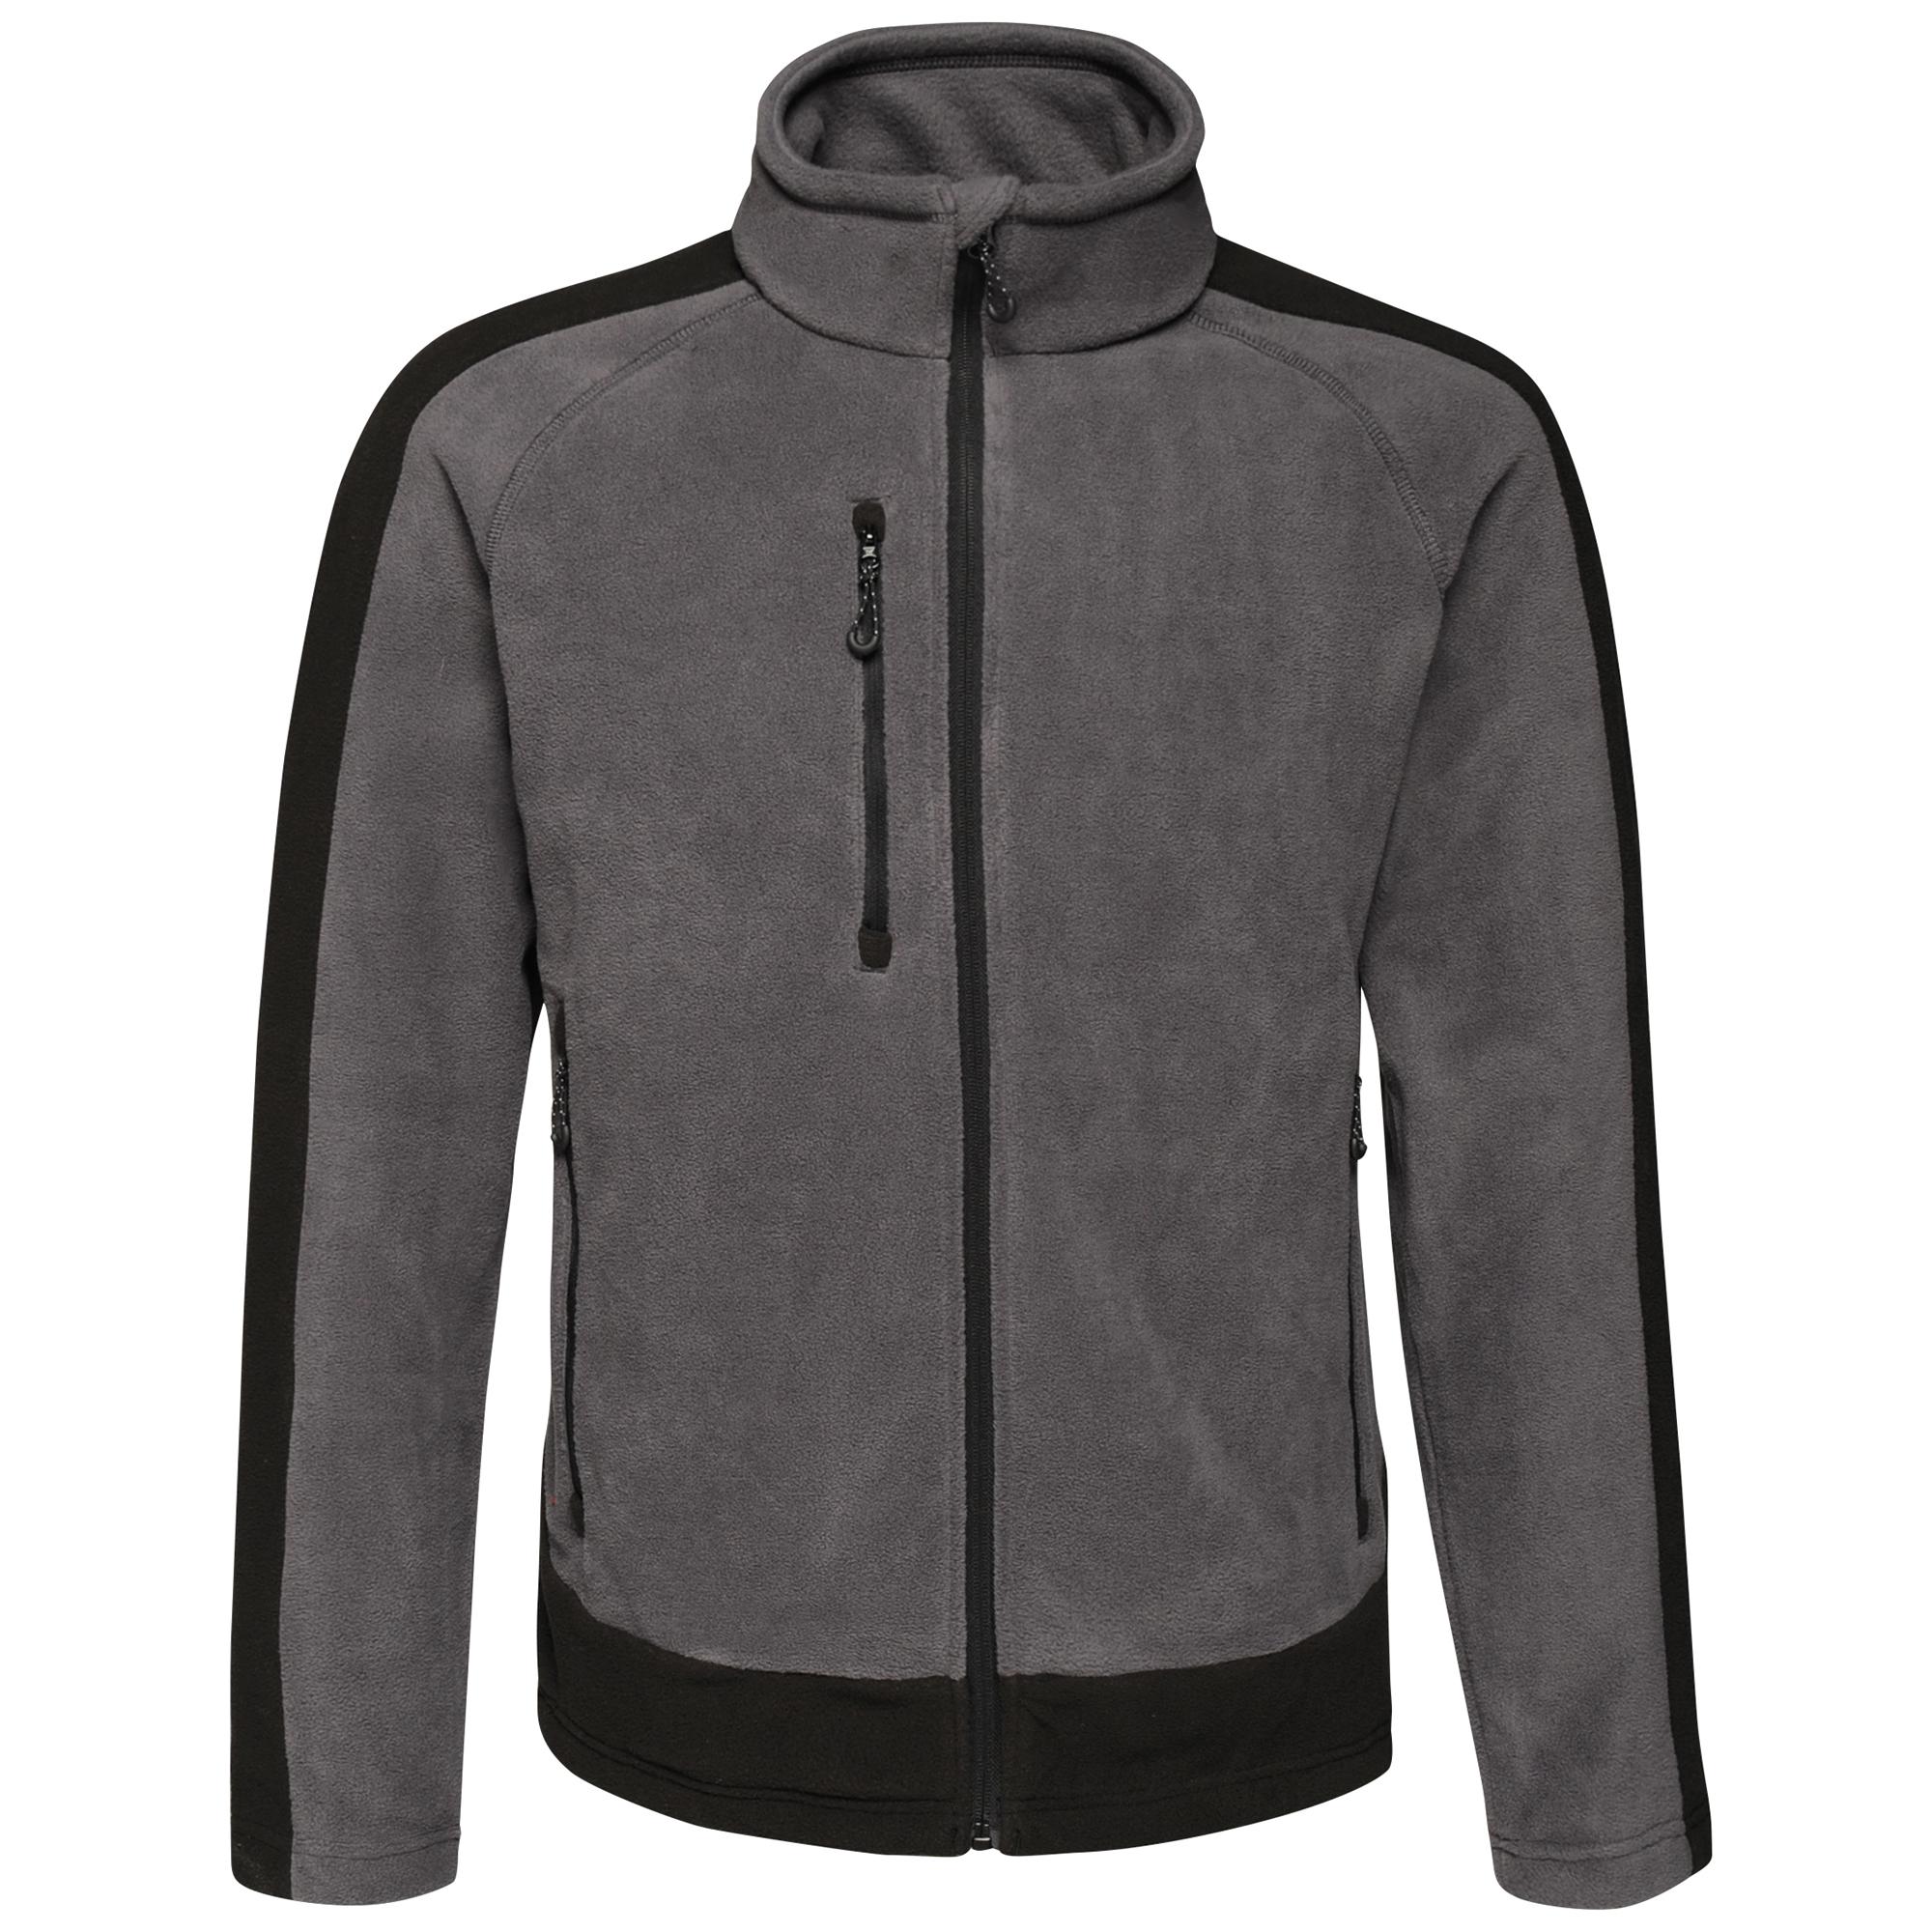 Regatta Contrast Mens 300 Fleece Top/Jacket (2XL) (Seal/Black)